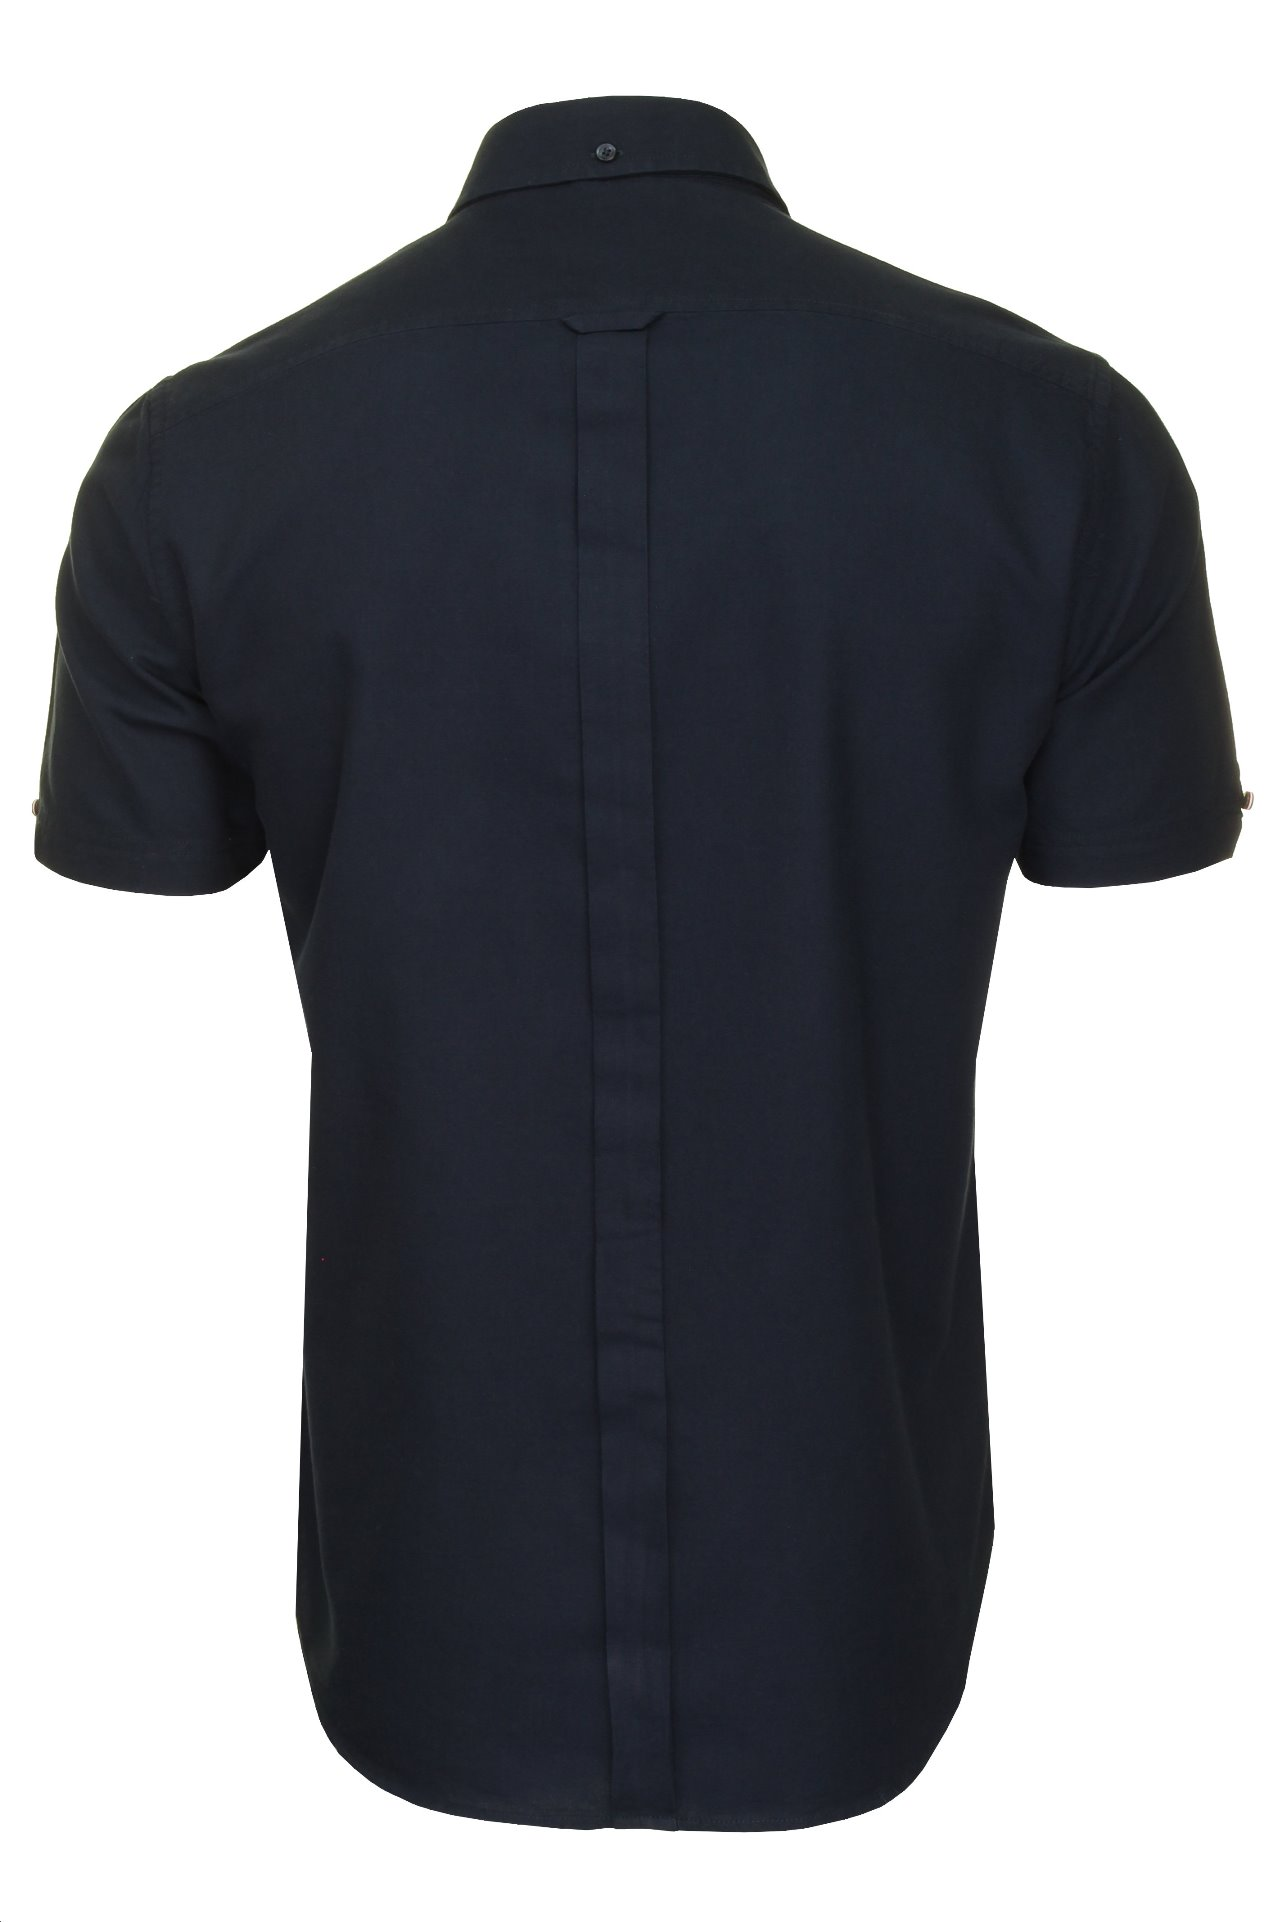 Ben-Sherman-Mens-Oxford-Shirt-Short-Sleeve thumbnail 18